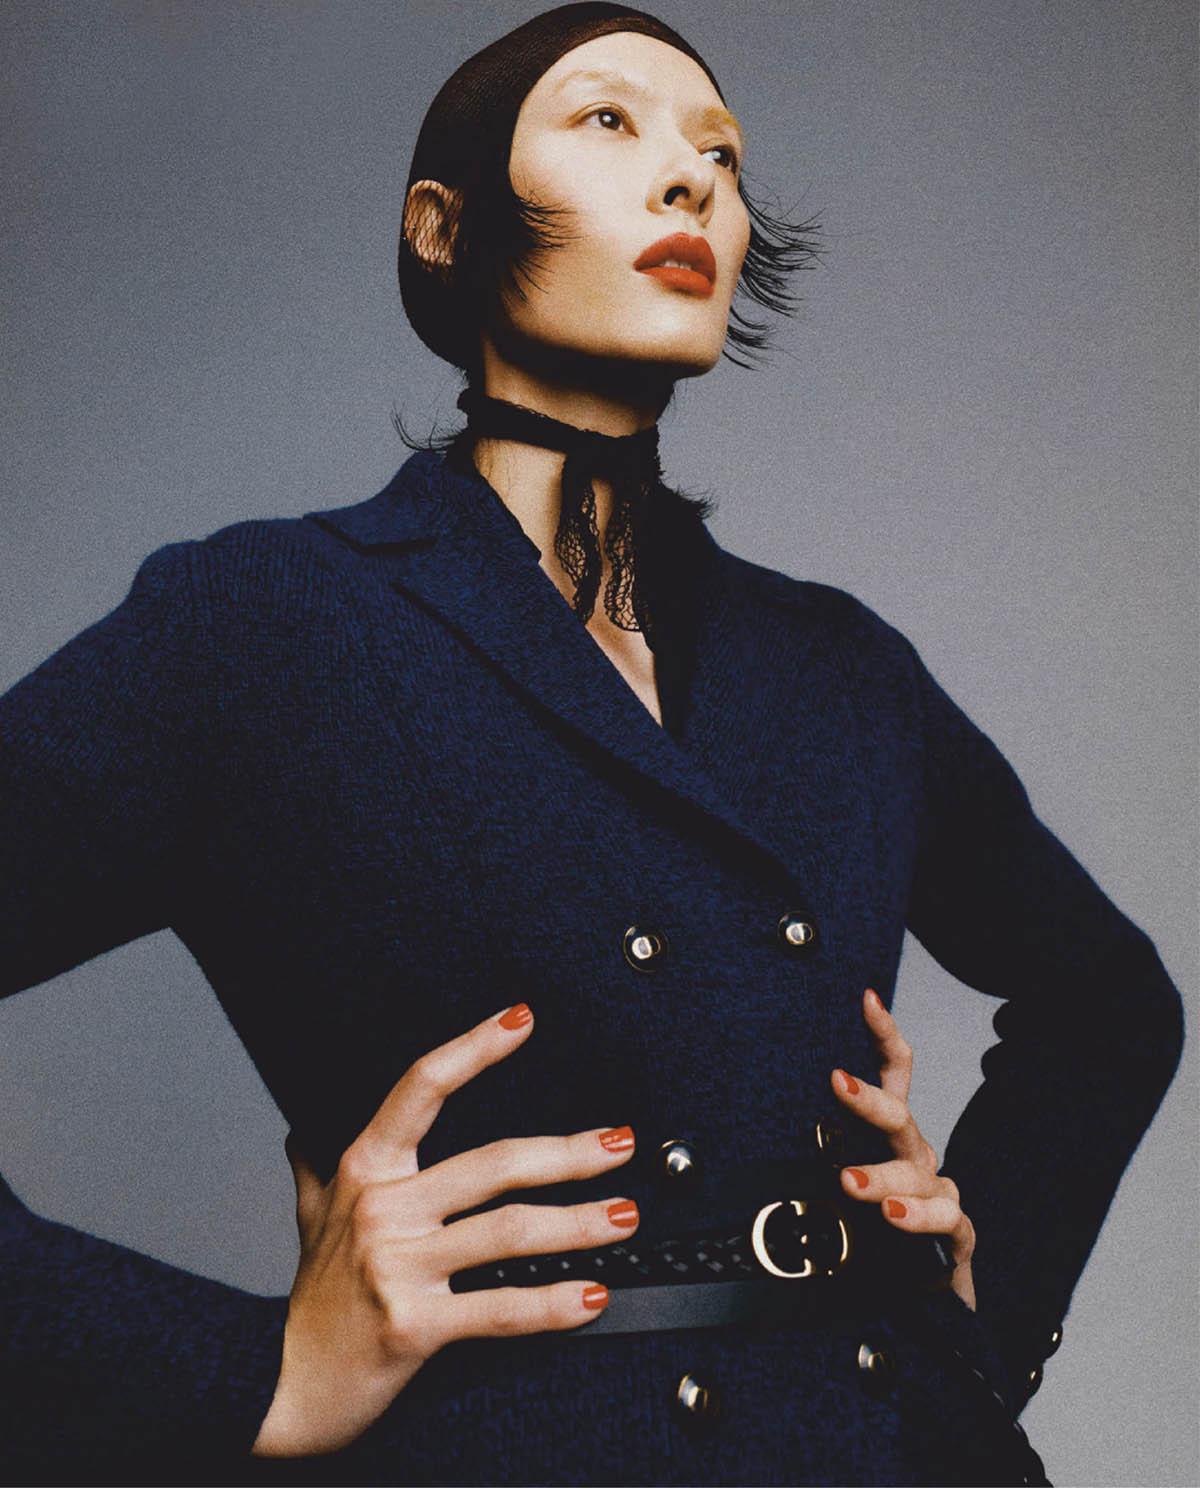 ''New Season'' by Zhong Lin for Vogue Taiwan March 2021